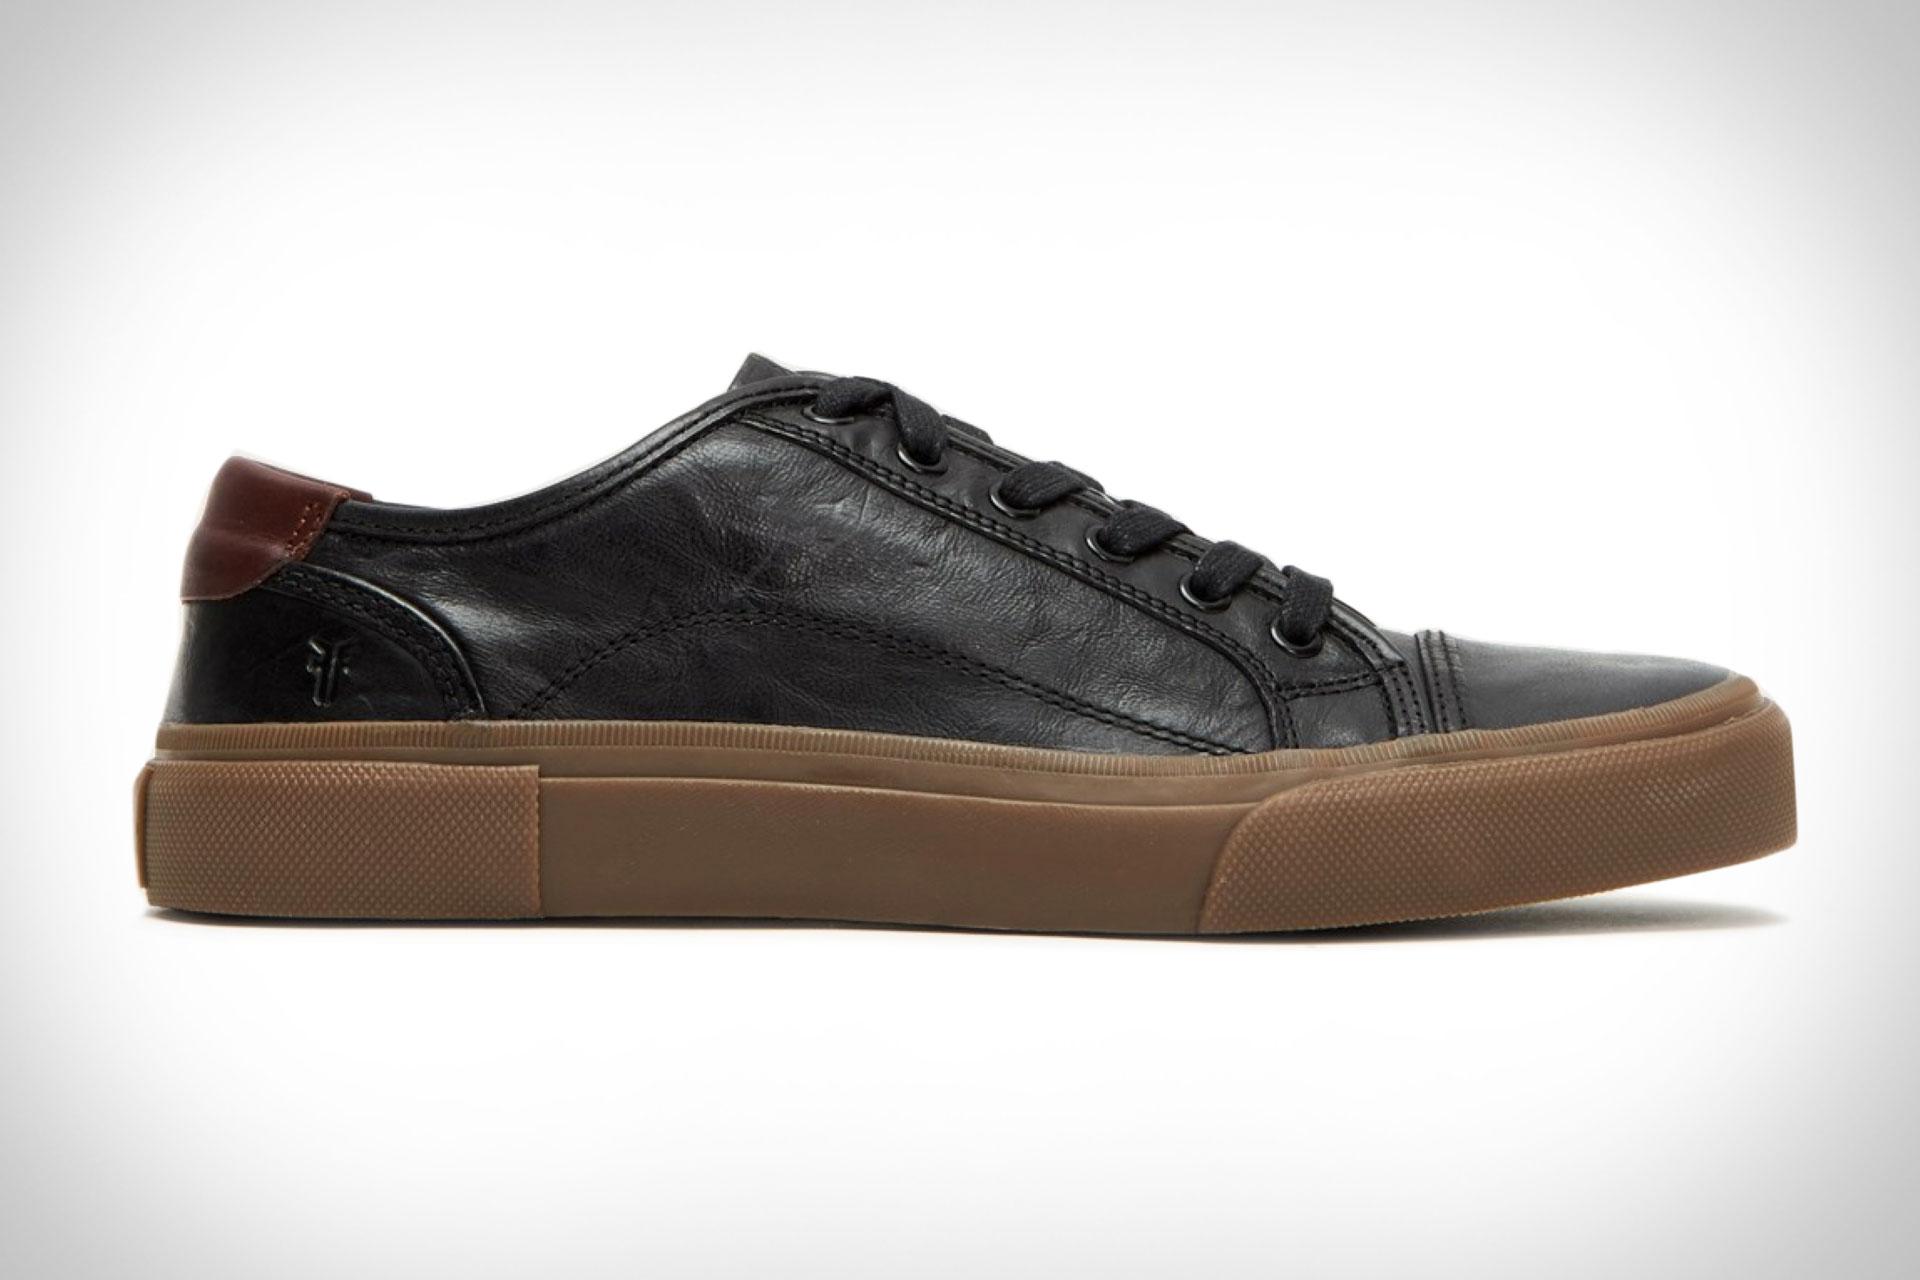 Frye Ludlow Bal Oxford Sneakers | Uncrate